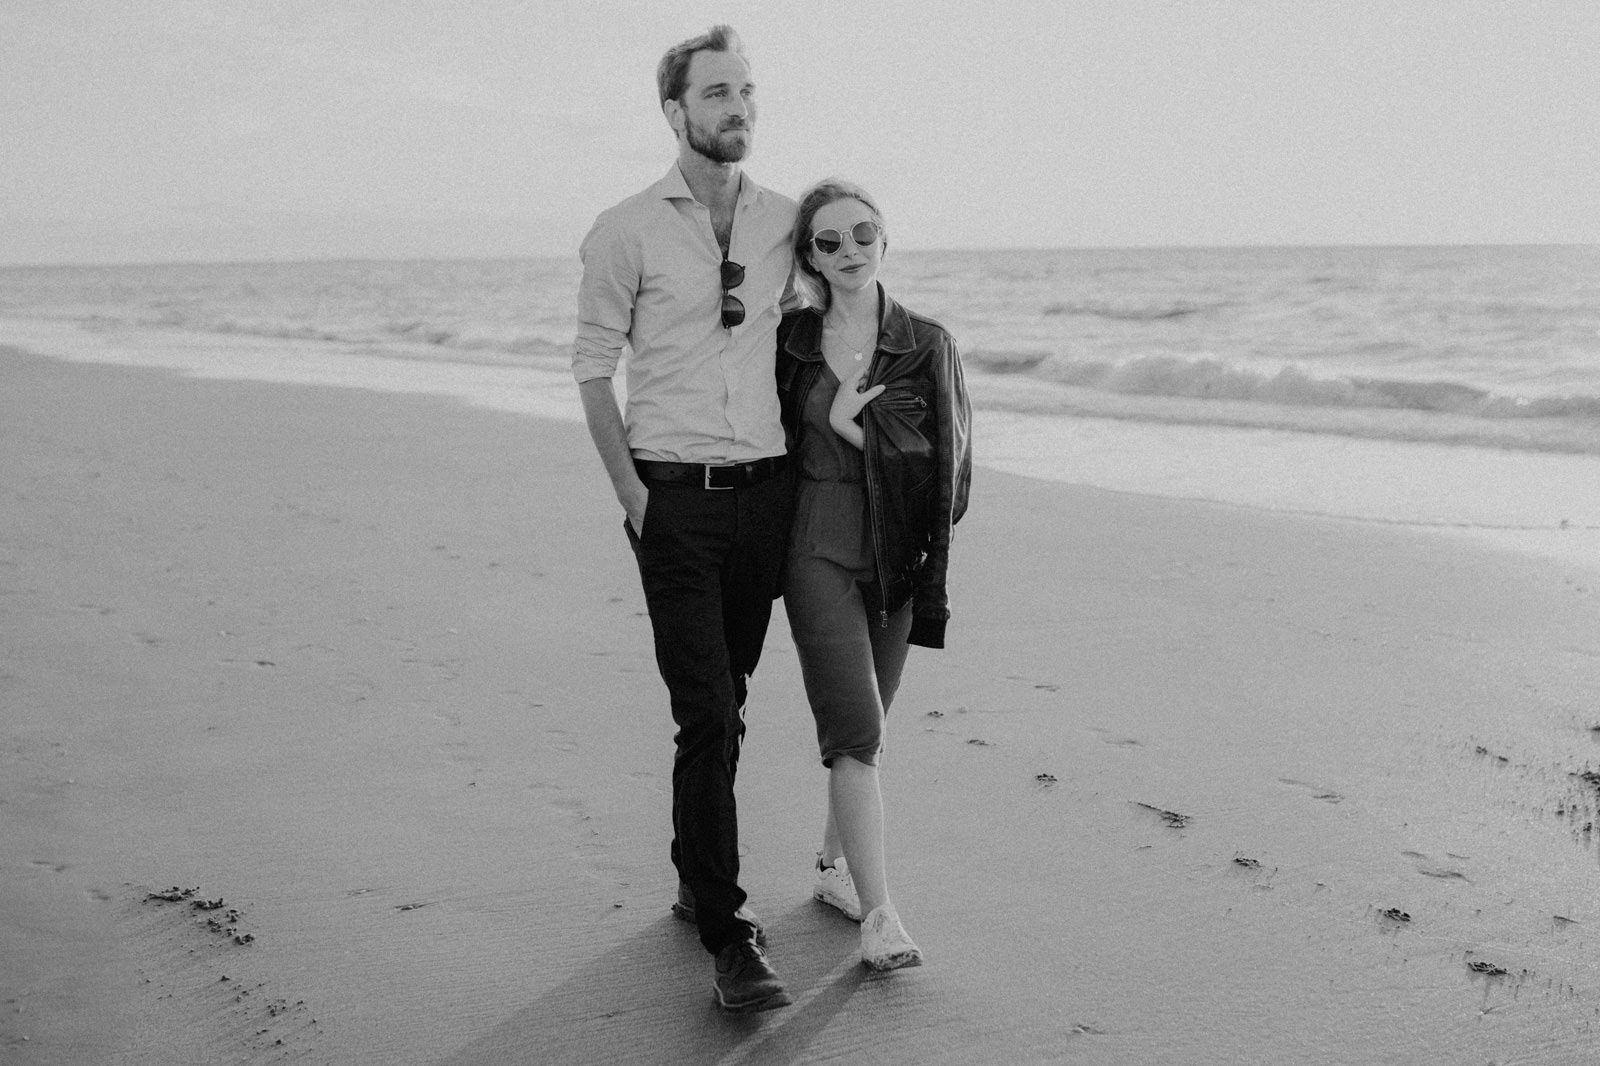 couple rock fun plage danser liberté